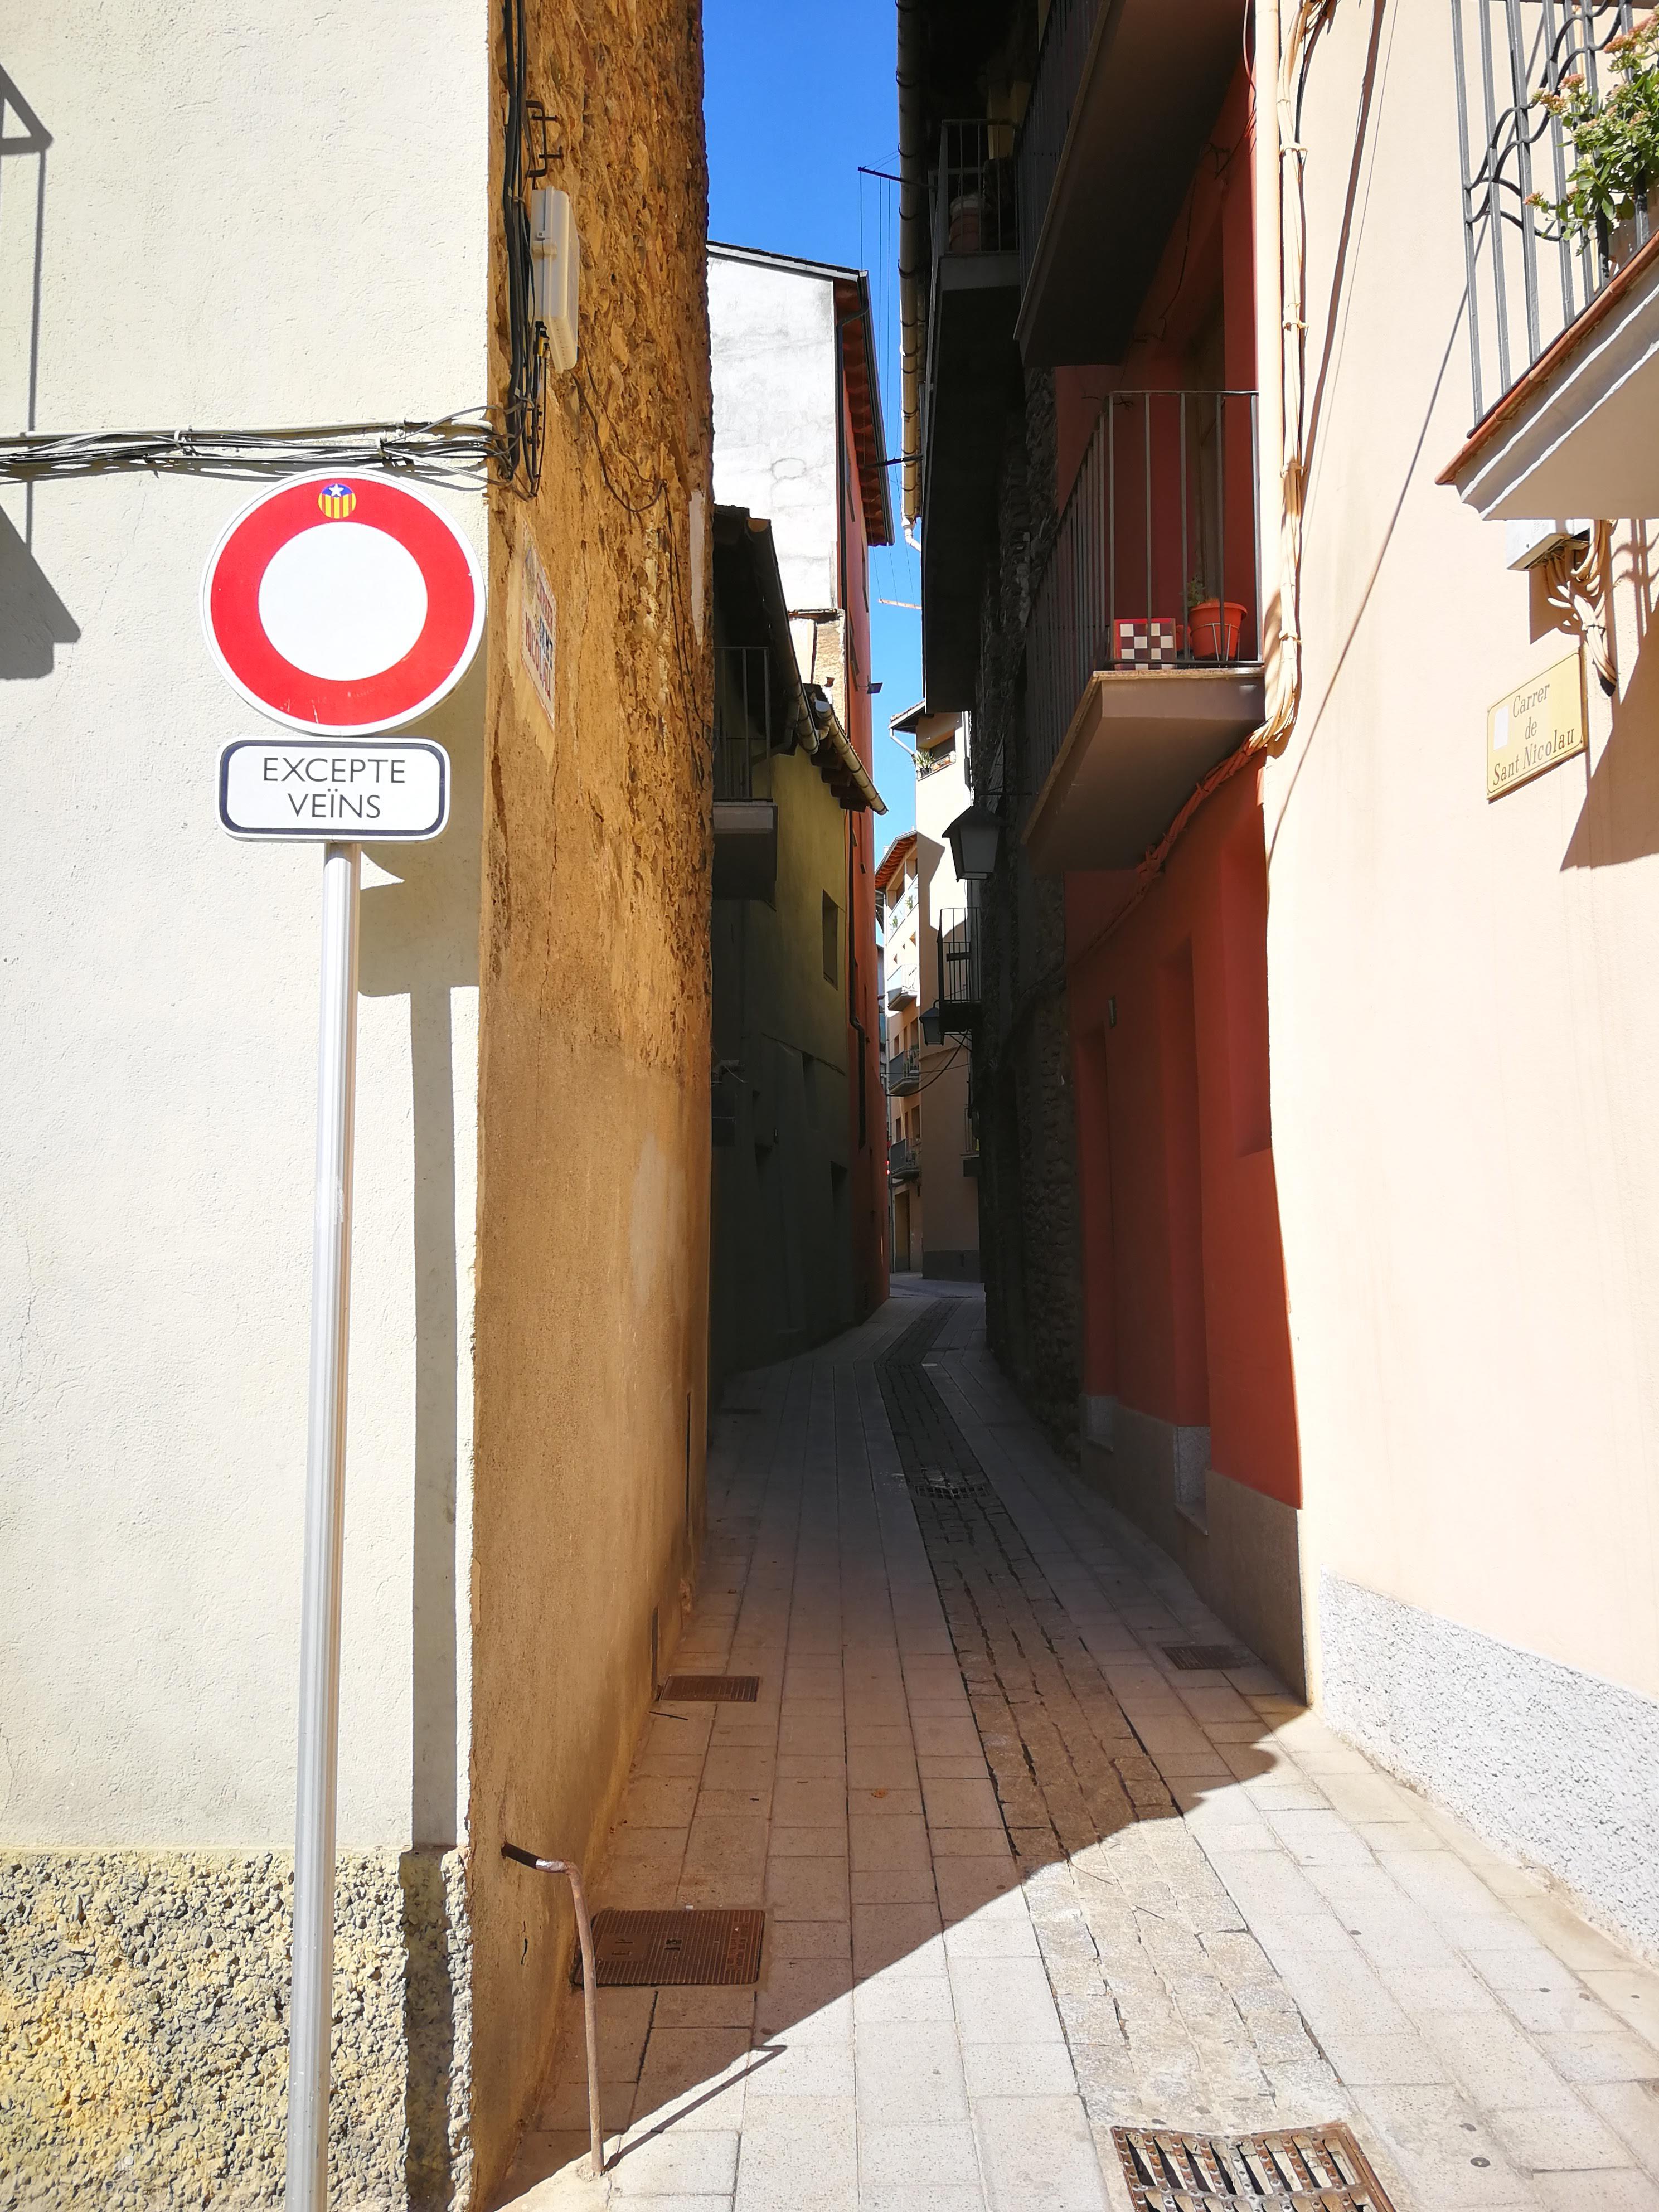 English Seo de Urgel, a Spanish city in the province of Lleida. Spanish Seo de Urgel, ciudad española en la provincia de Lérida. Simplified Chinese Seo de